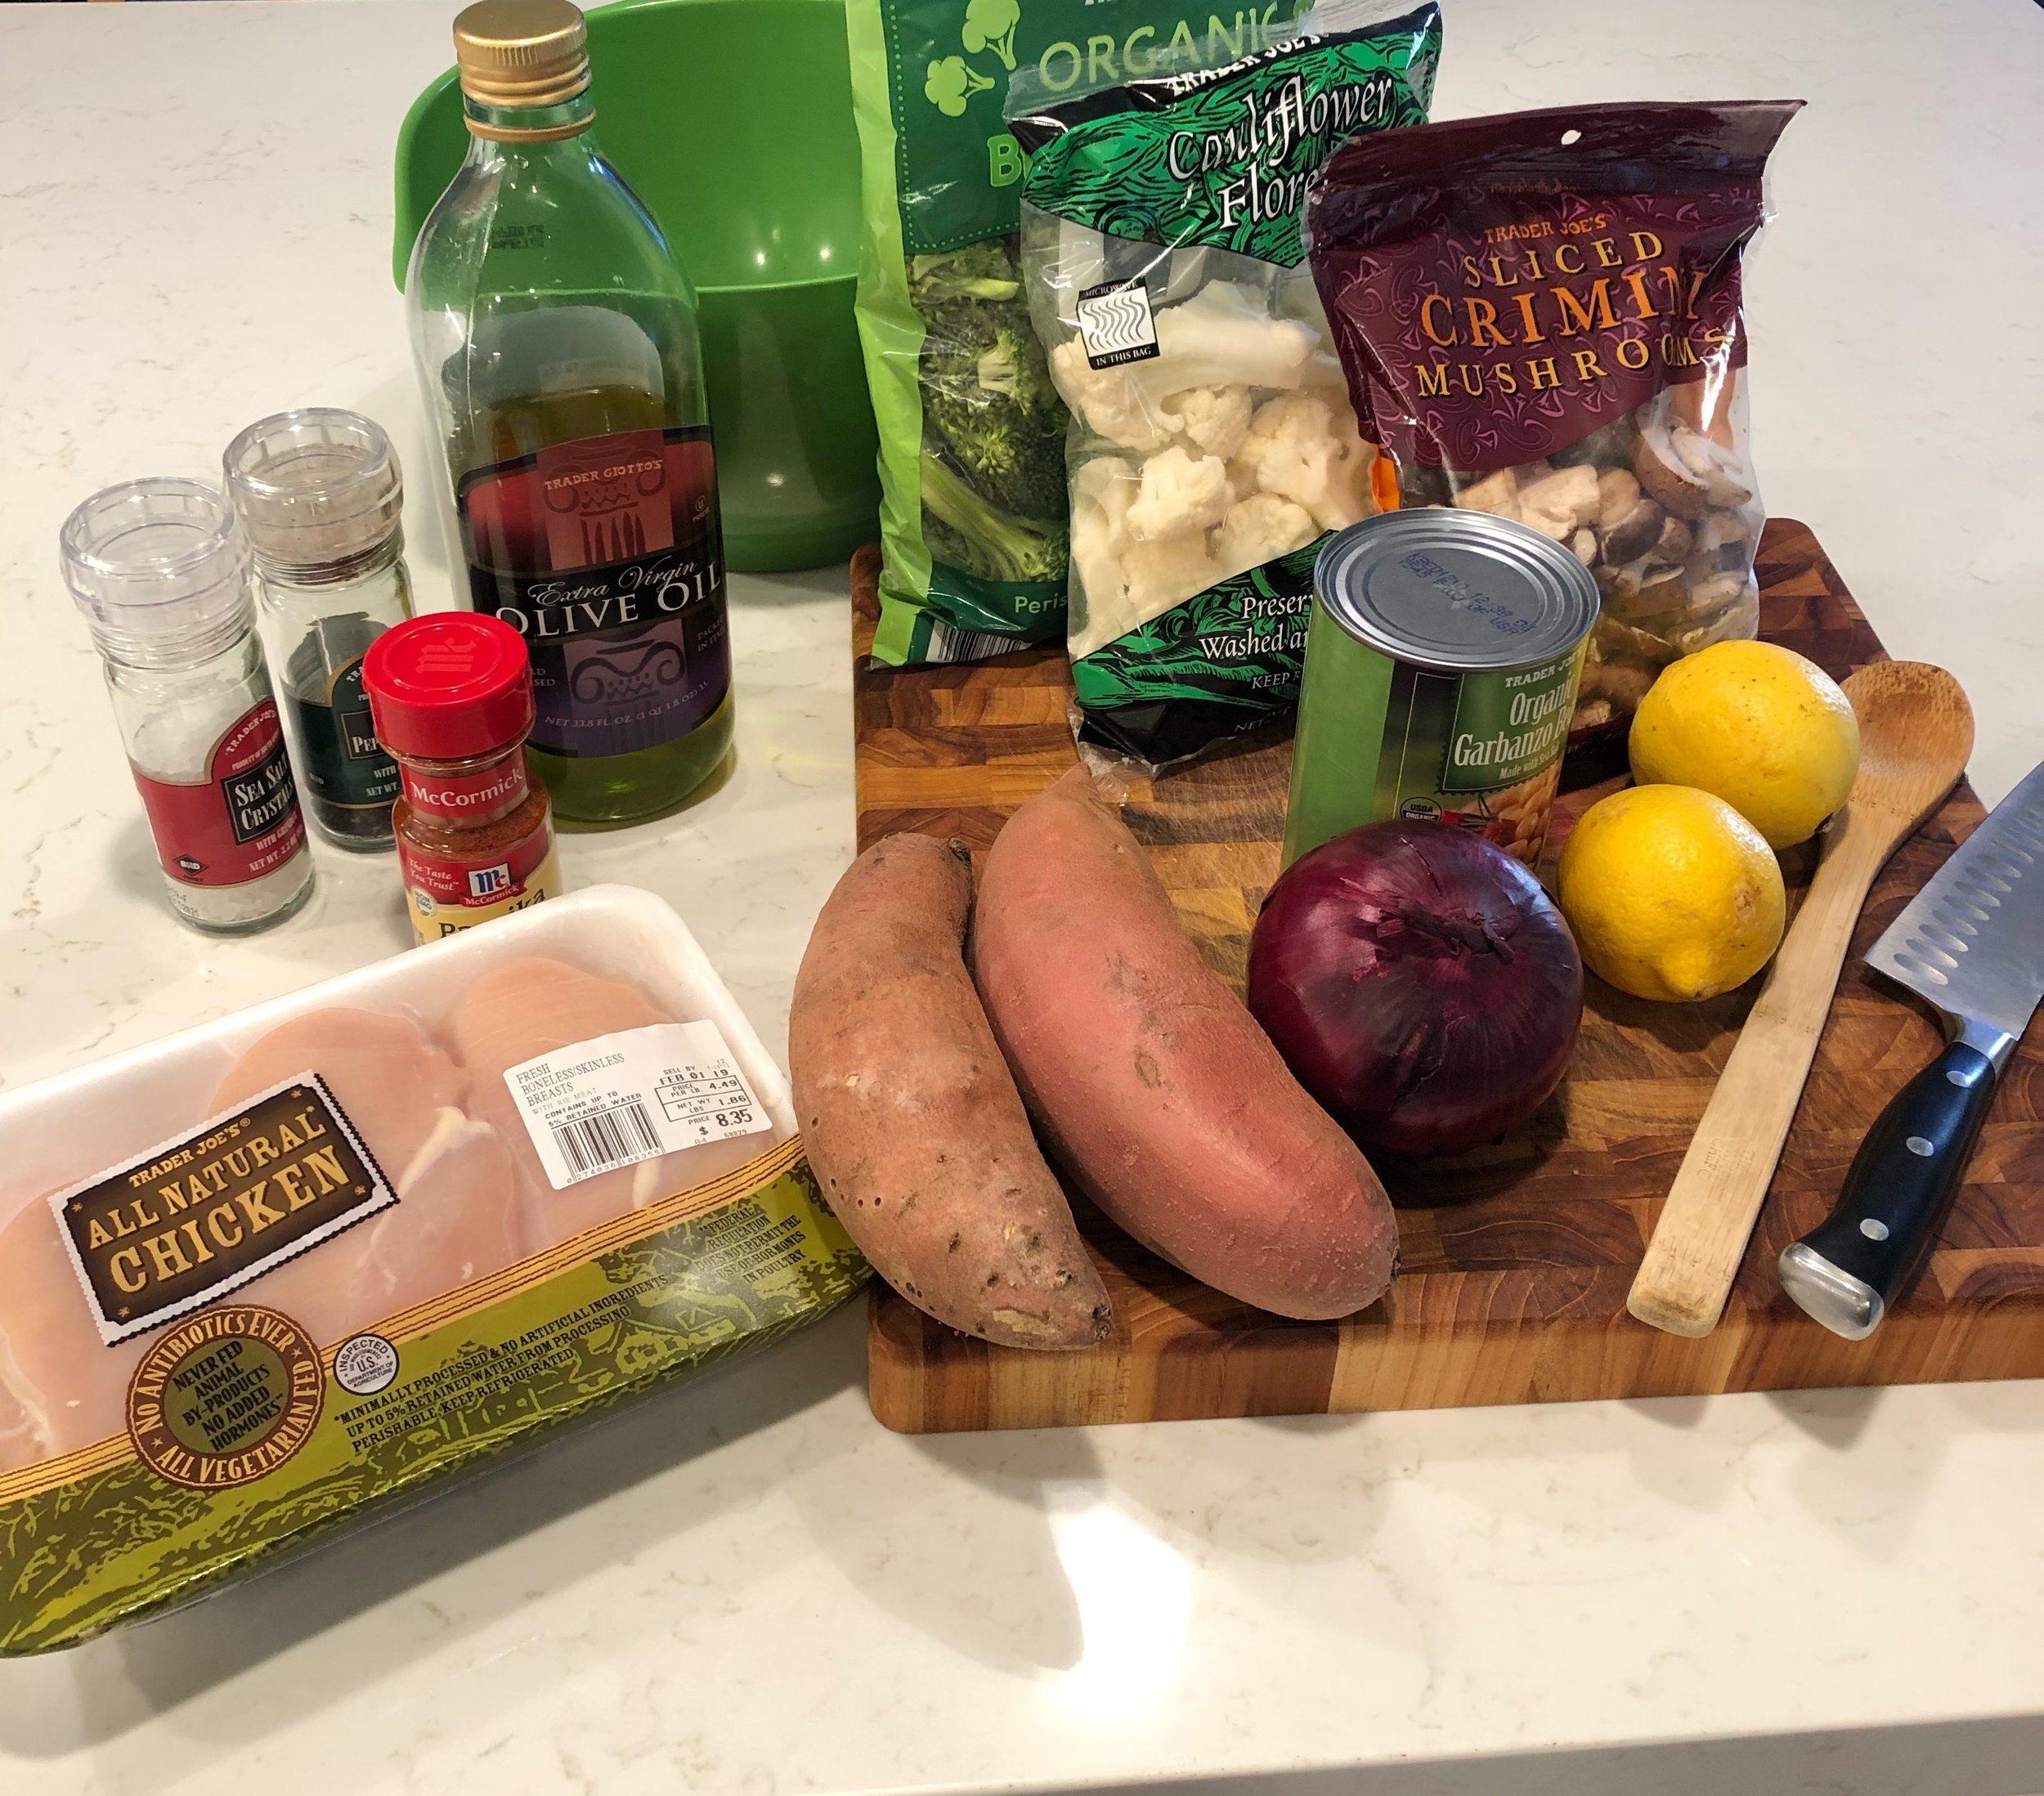 Ingredients for Shem's One Sheet Pan Dinner